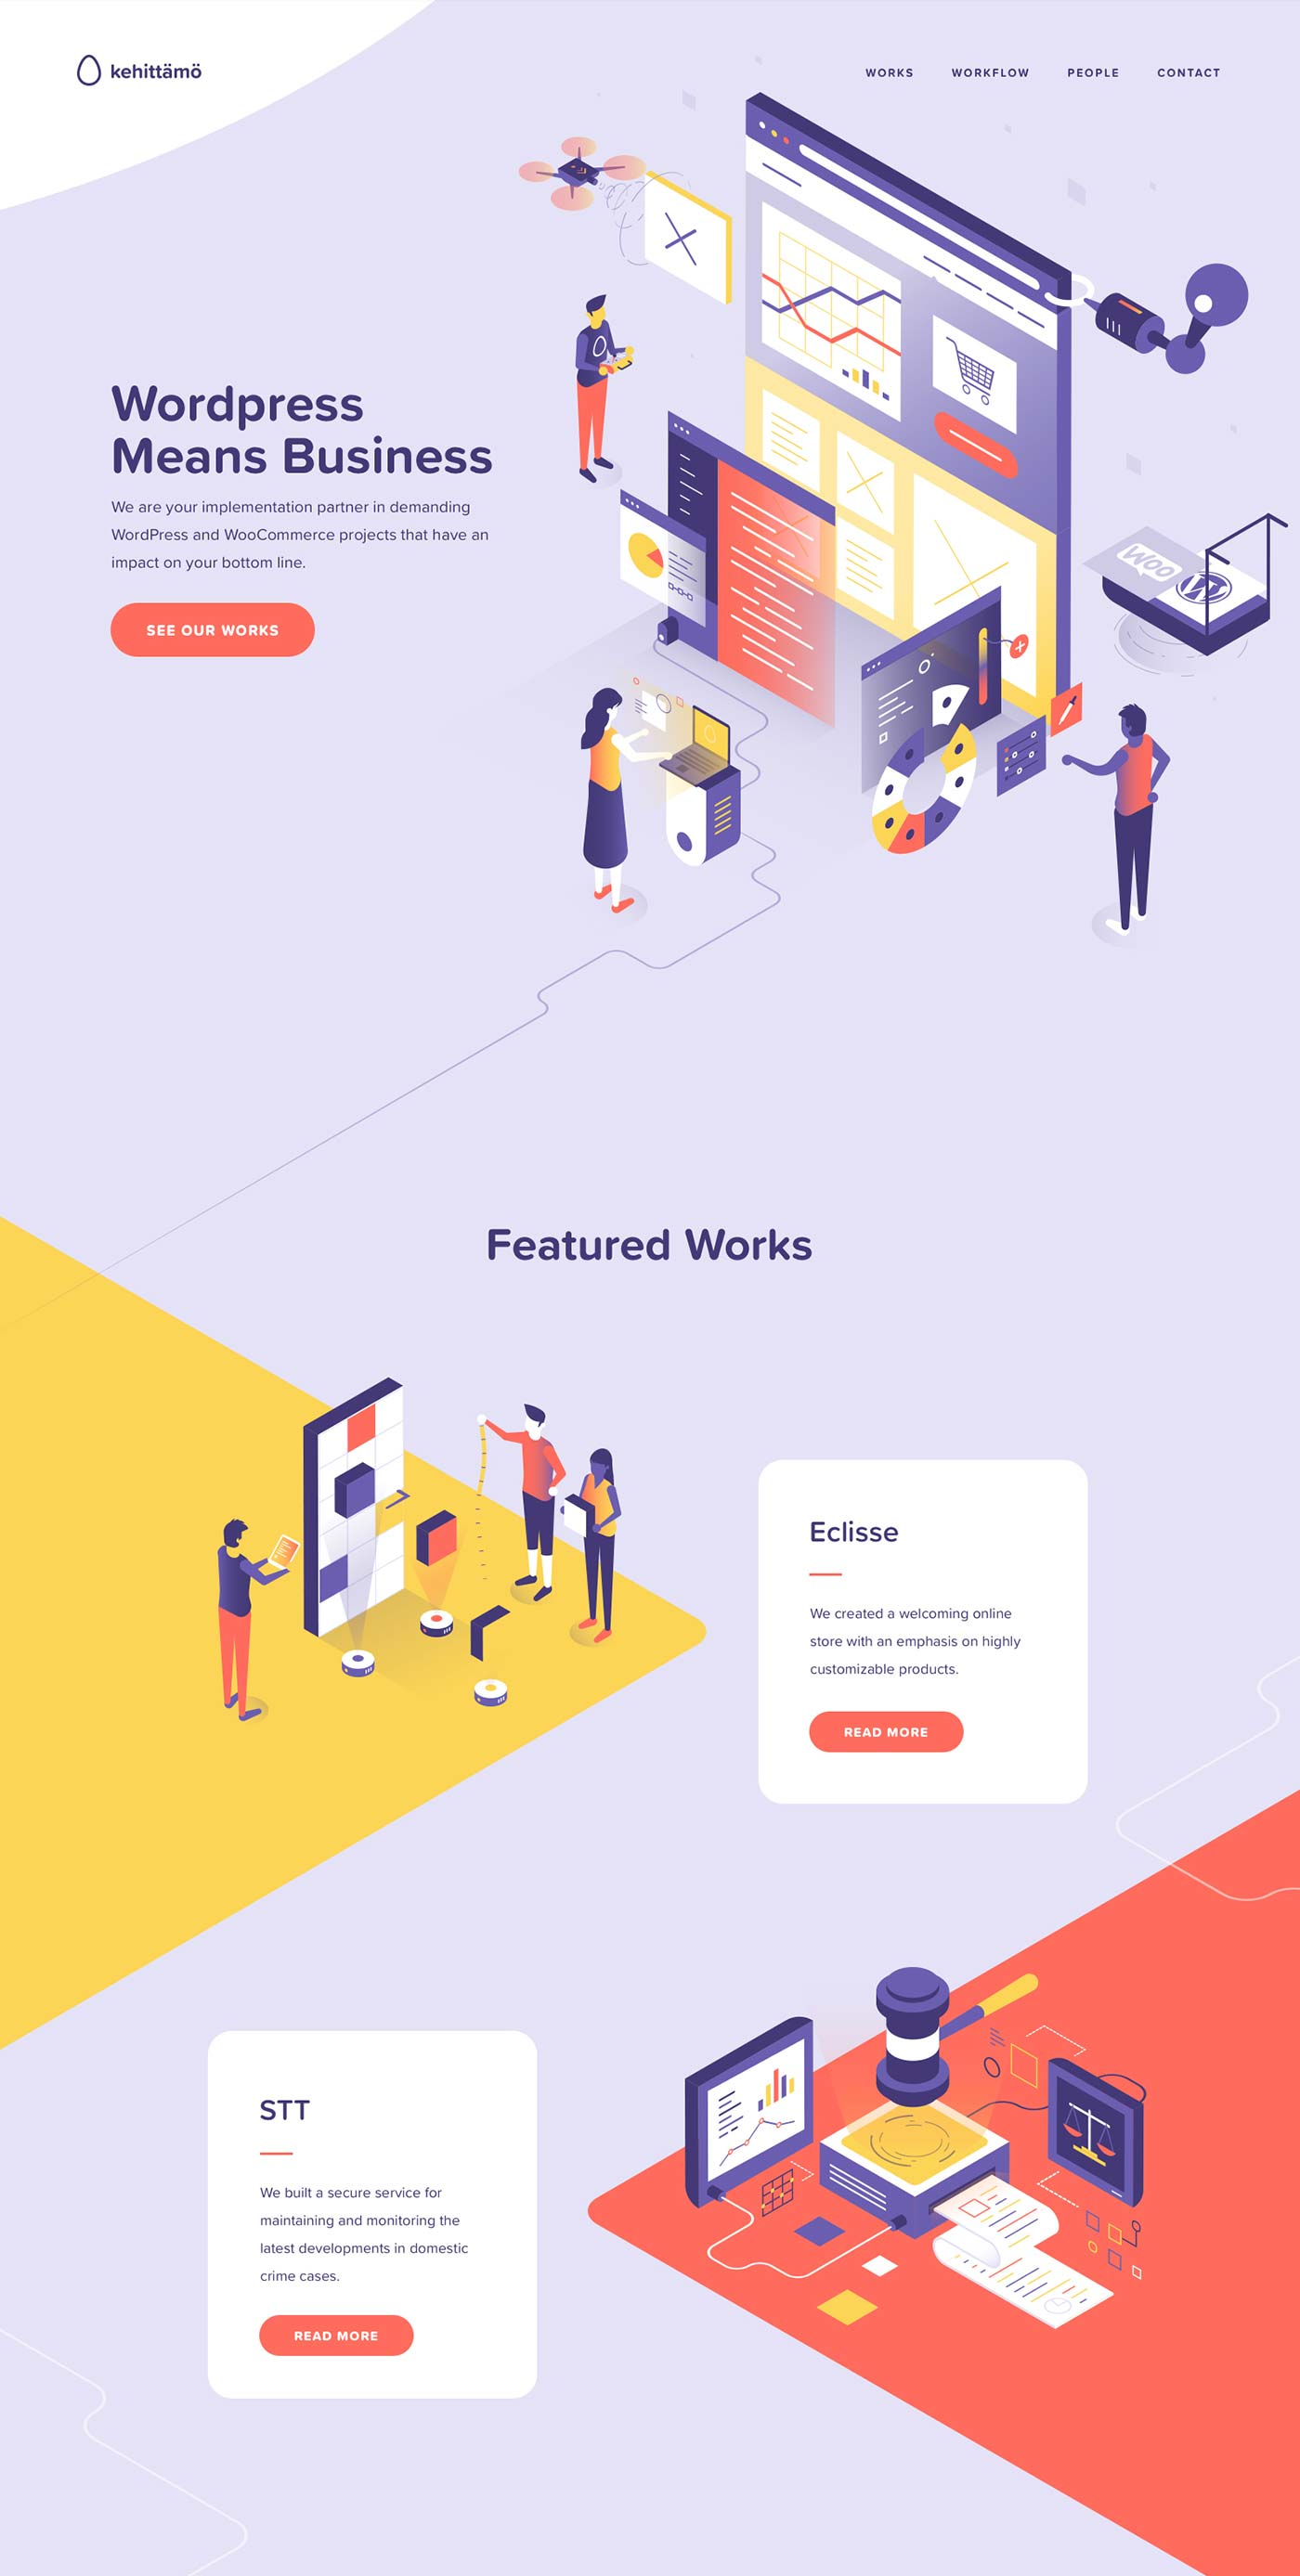 Oli Lisher freelance website / graphic designer